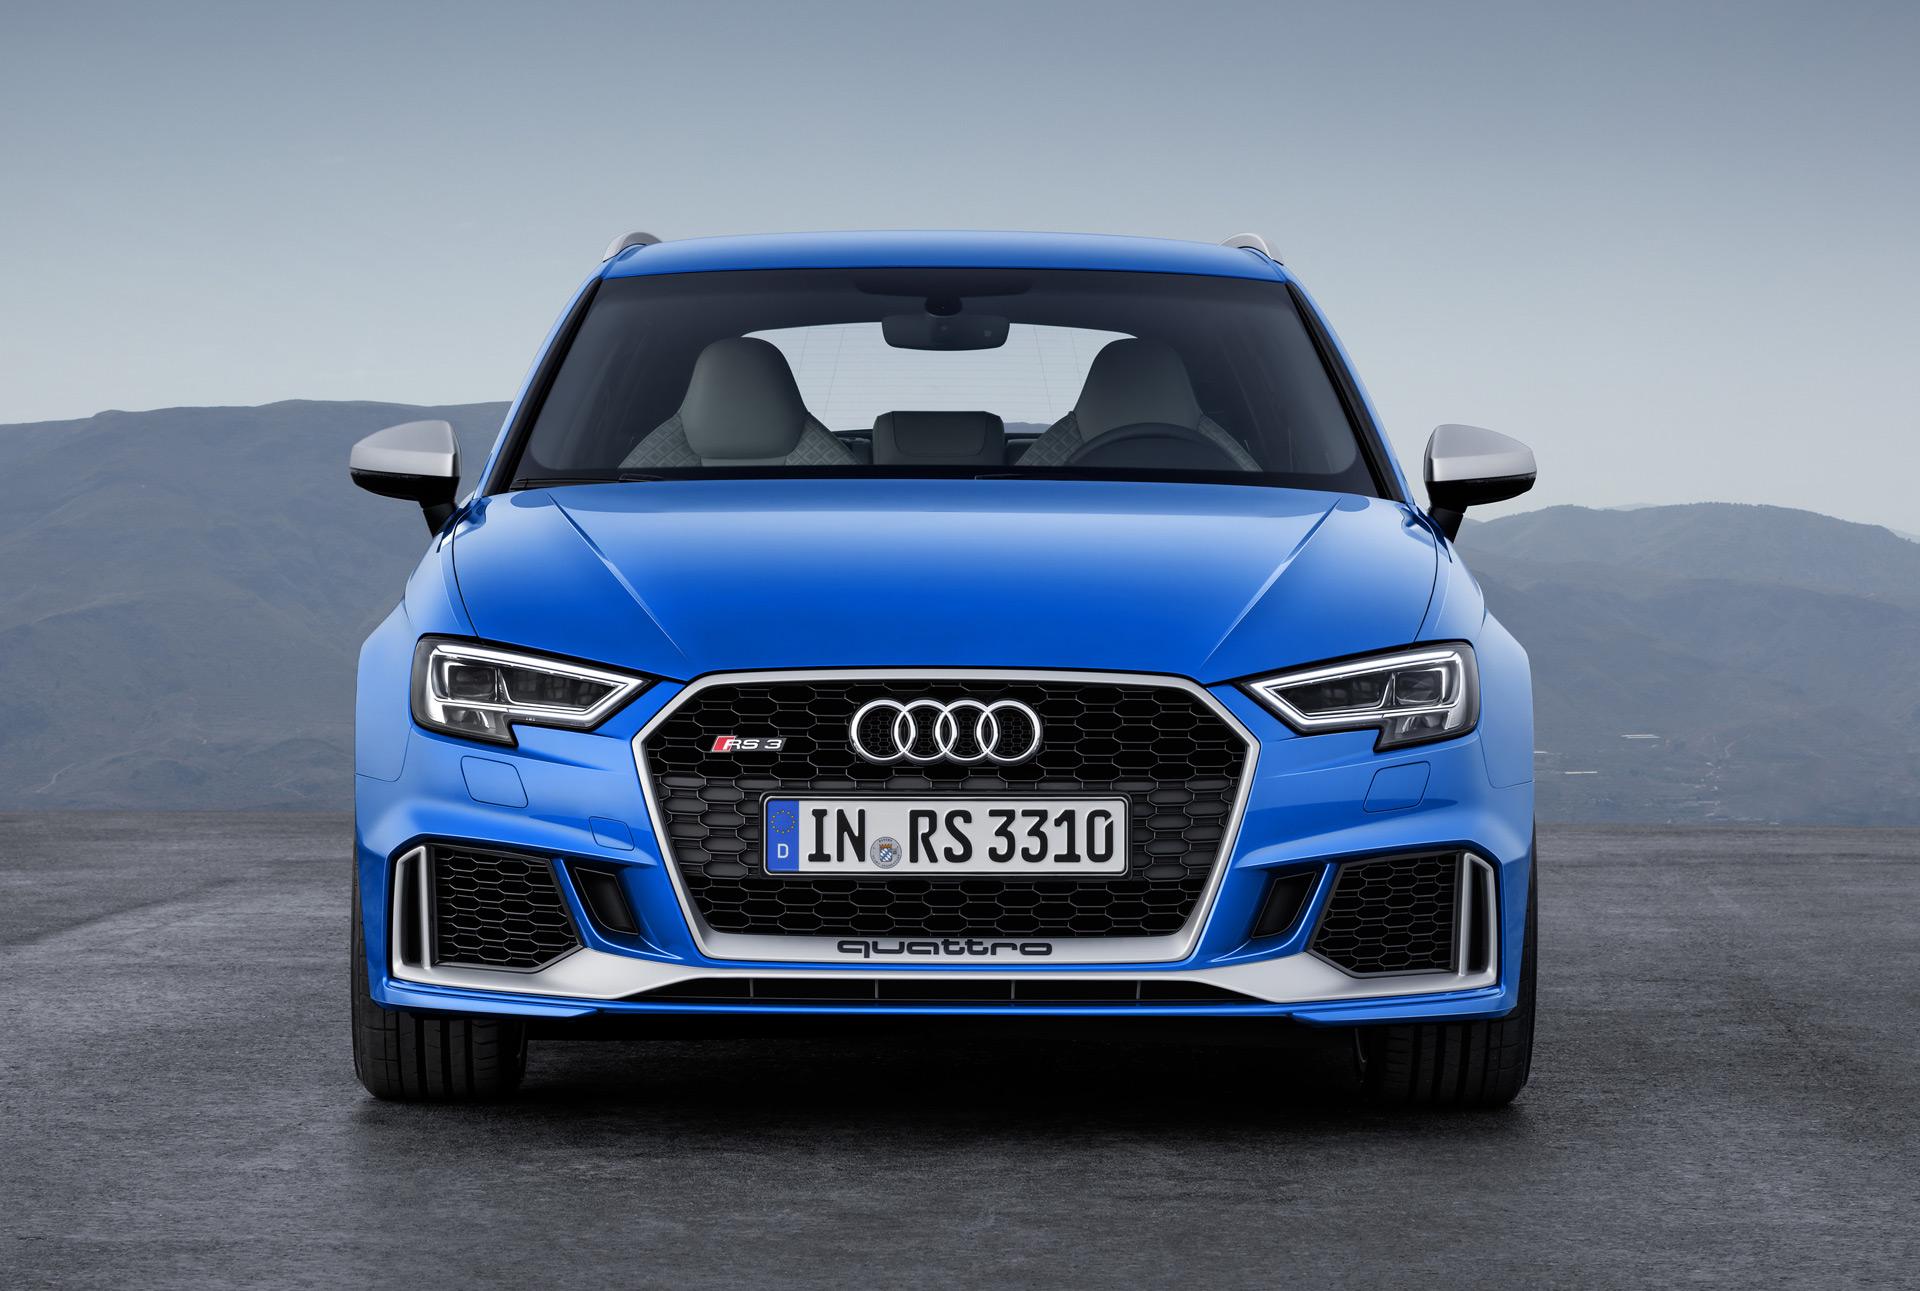 Audi RS 3, Lamborghini Urus, Mopar '17 Dodge Challenger ...